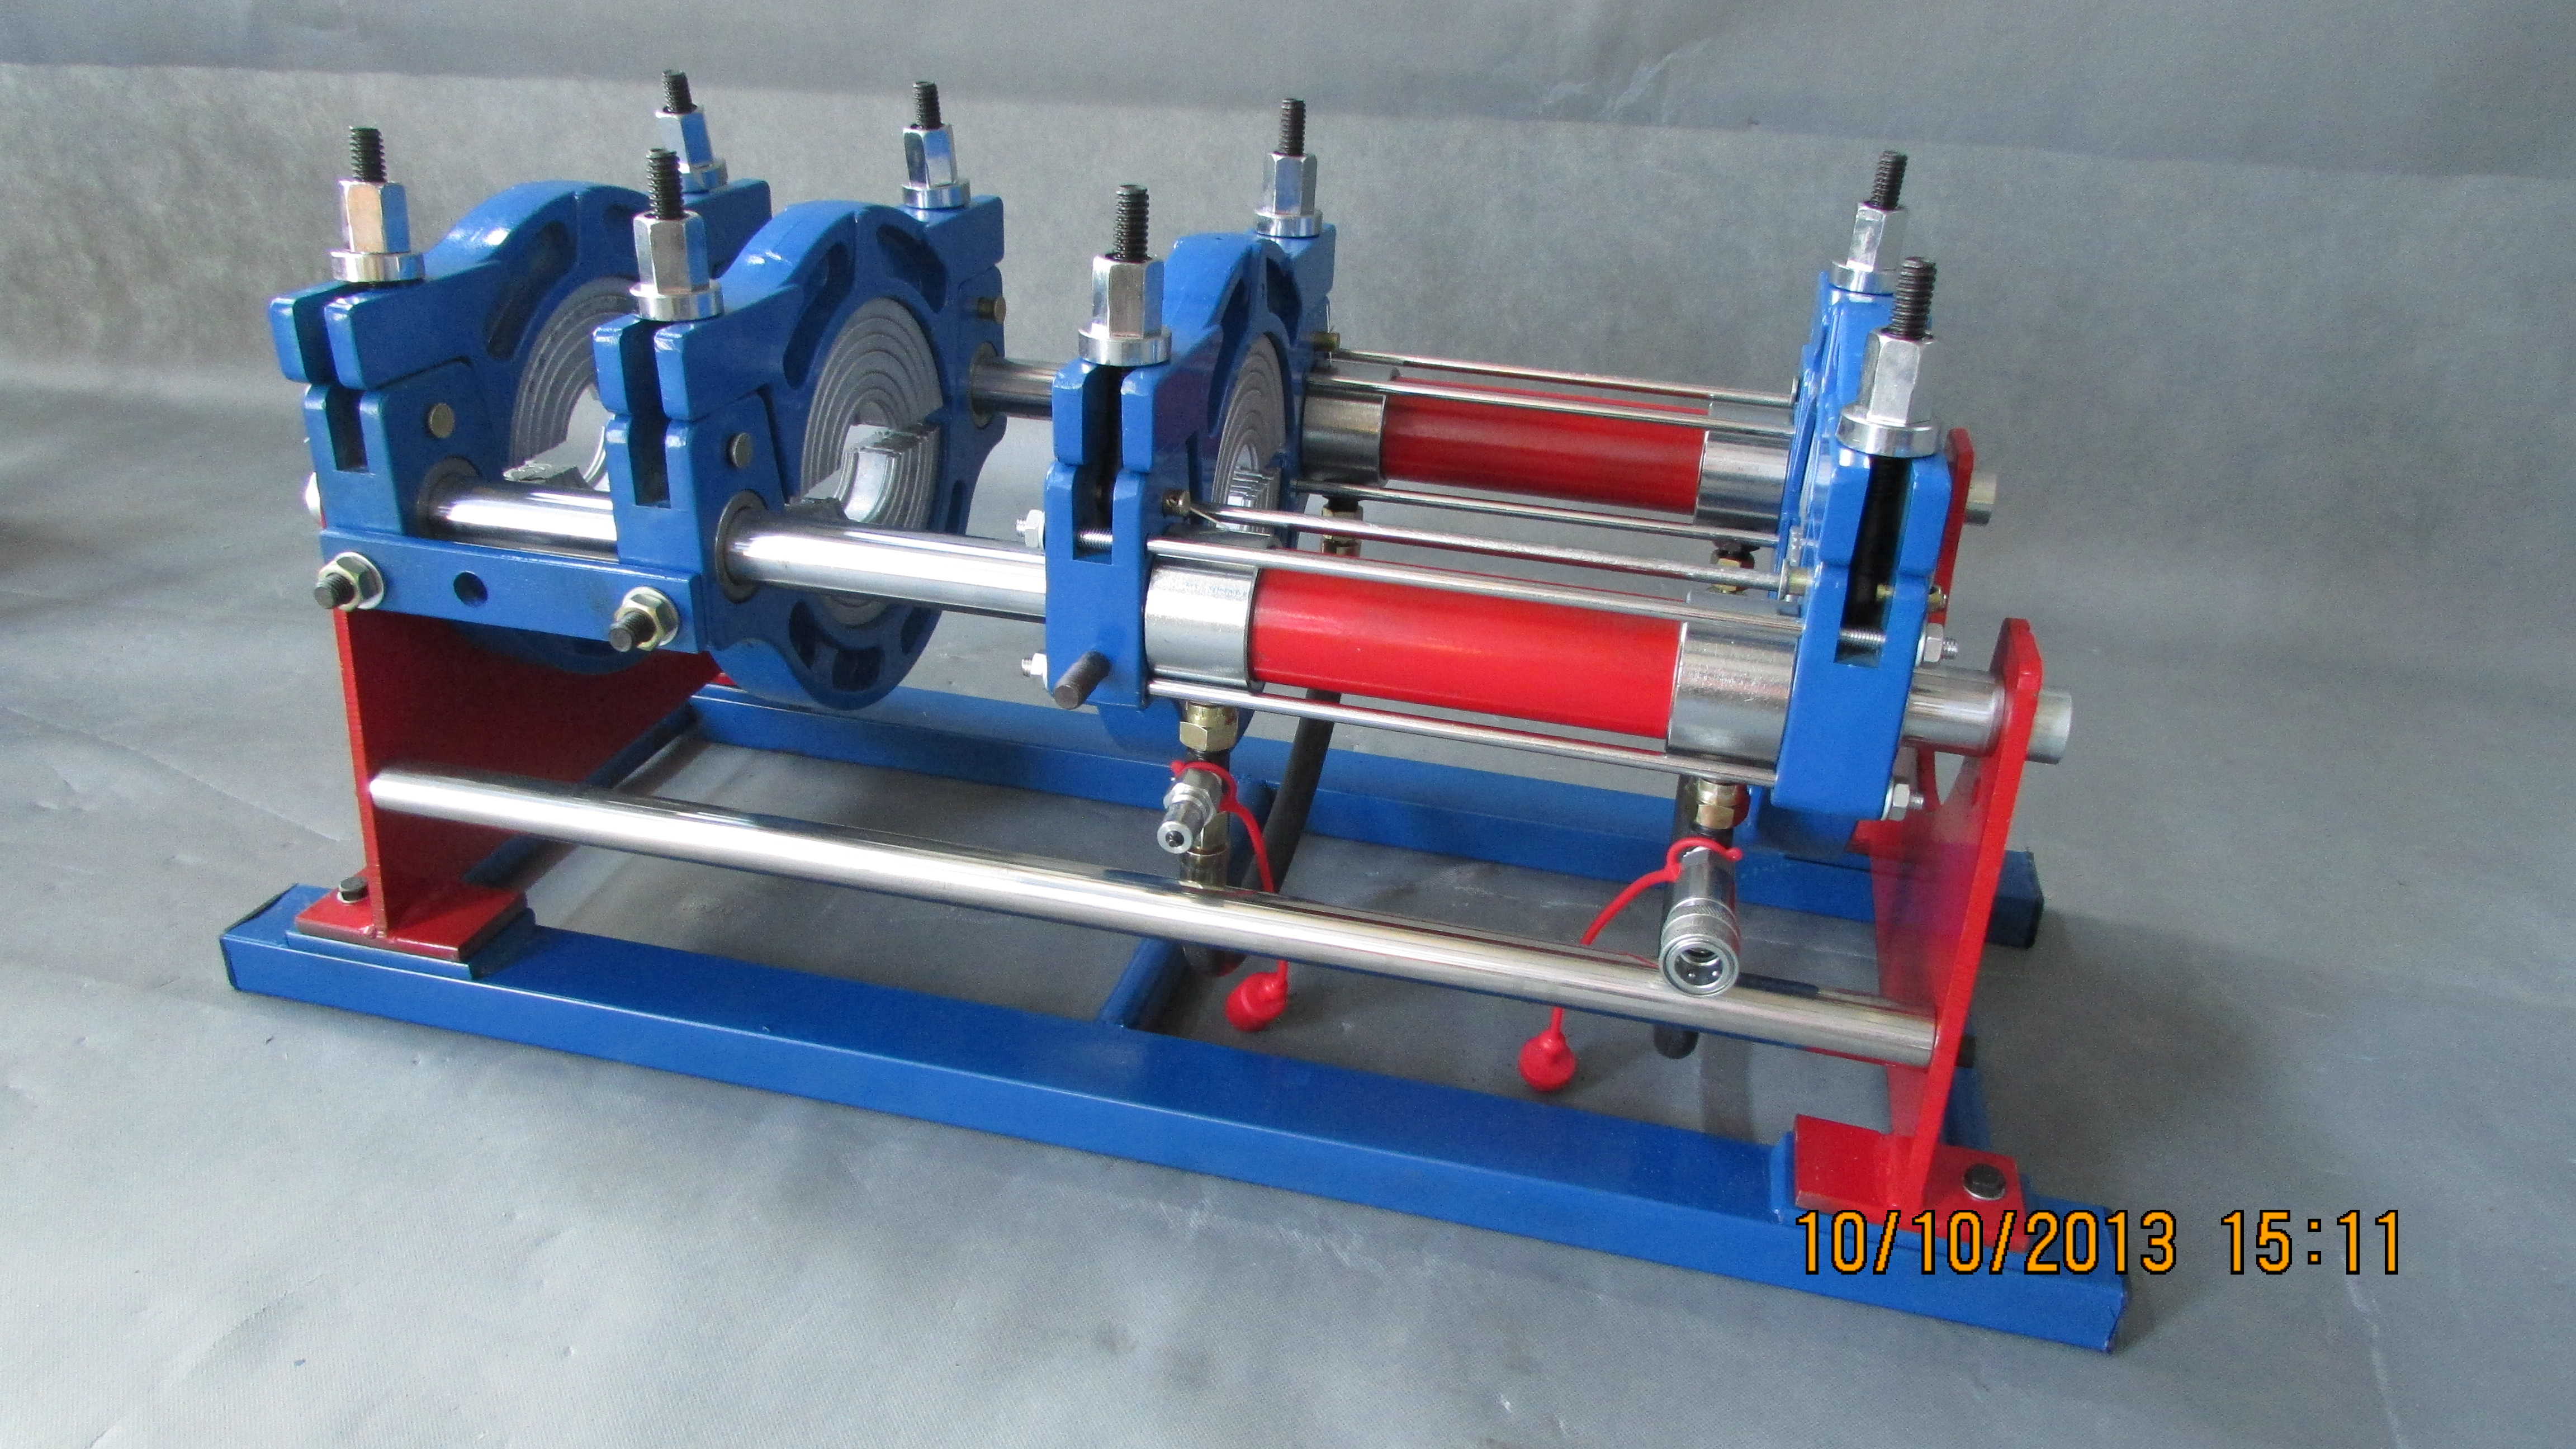 hjc160华锦160半自动热熔焊接机(pe,ppr管道焊接机)